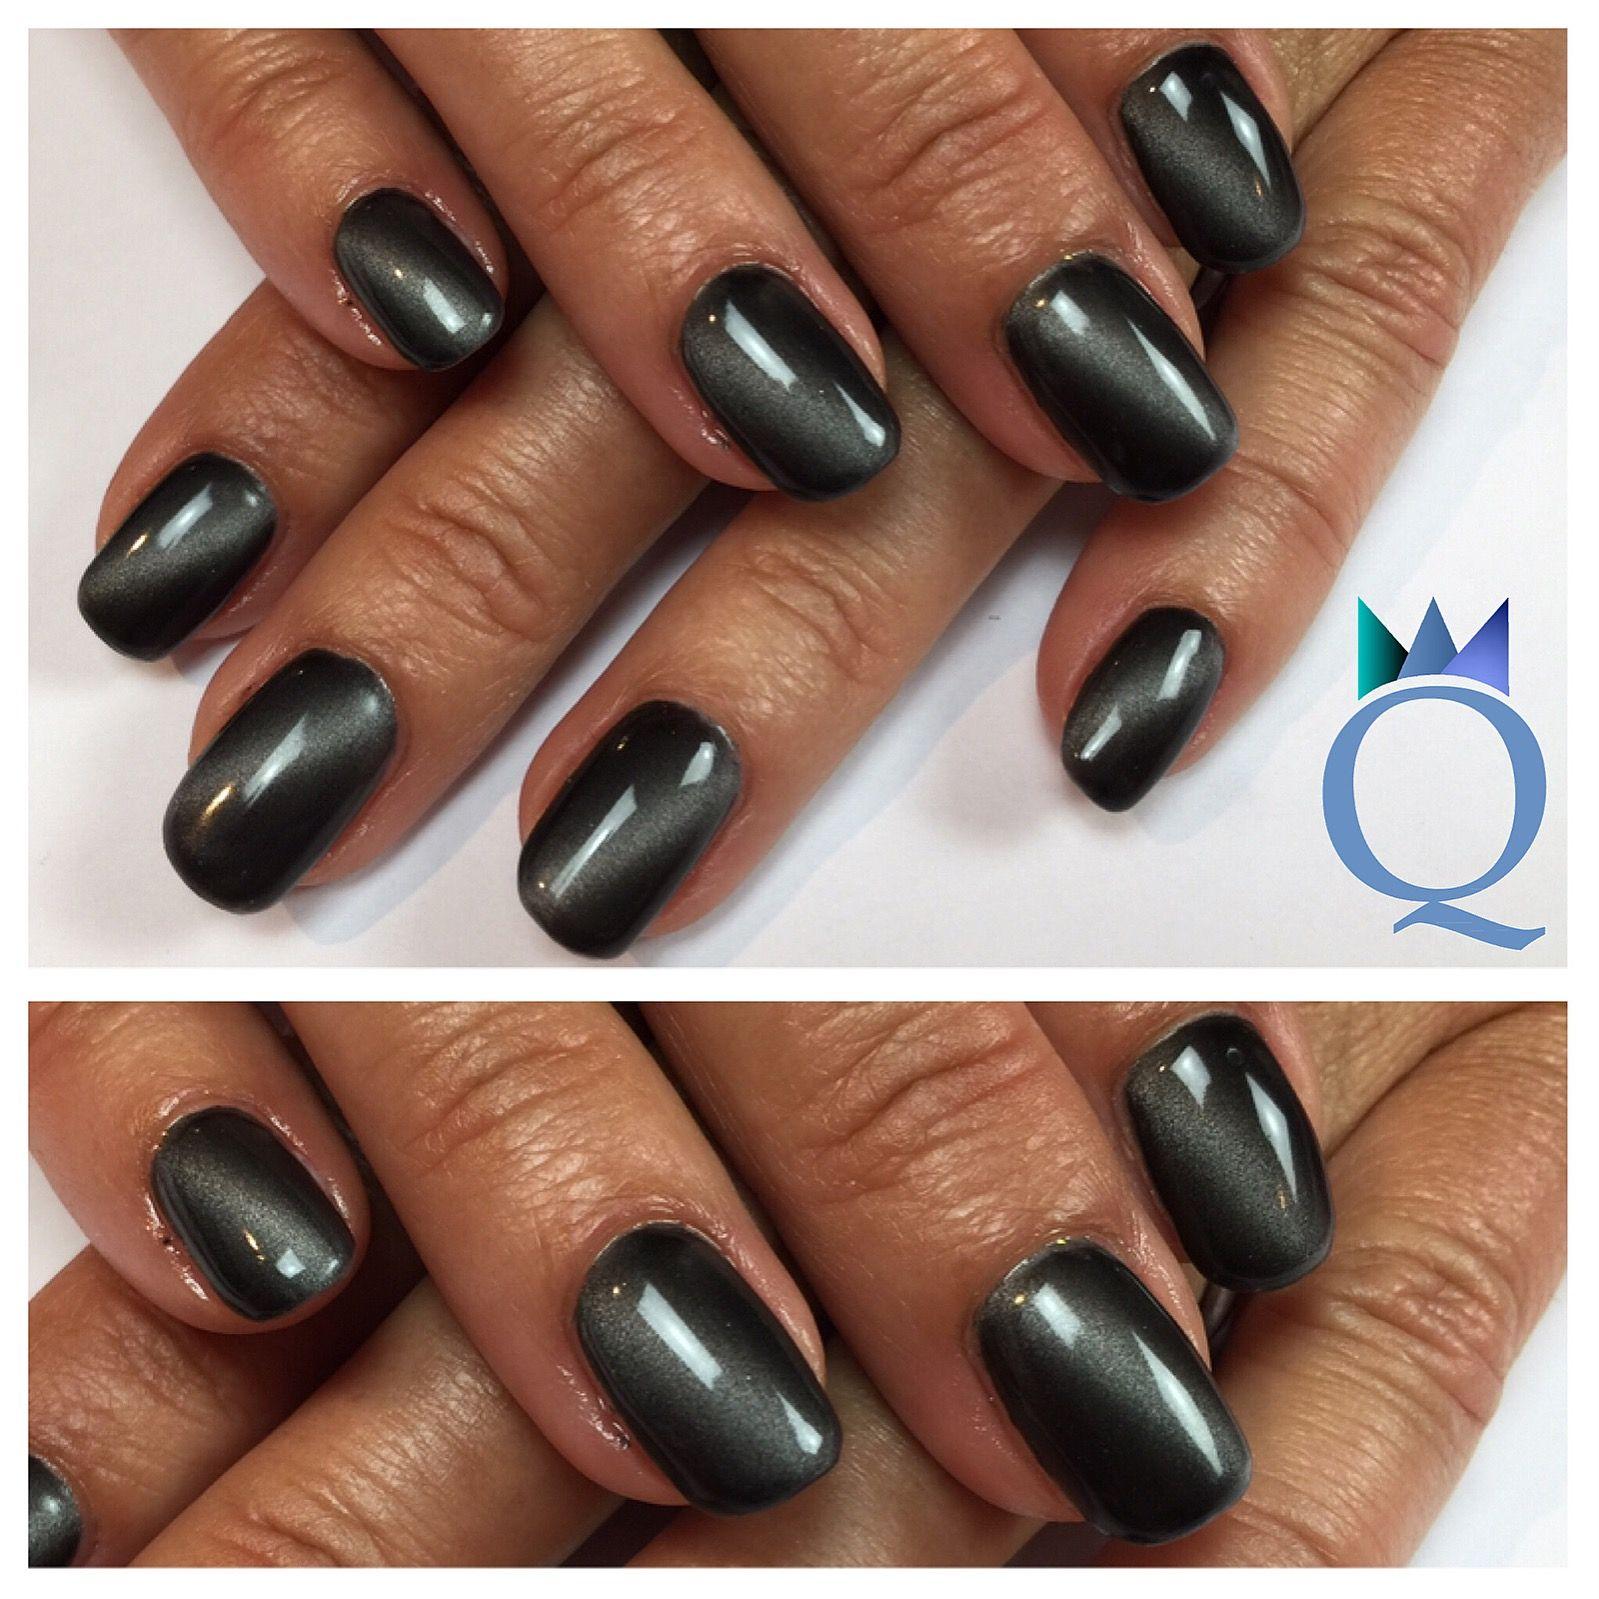 gelnails #nails #black #cateye #akyado #gelnägel #nägel #schwarz ...